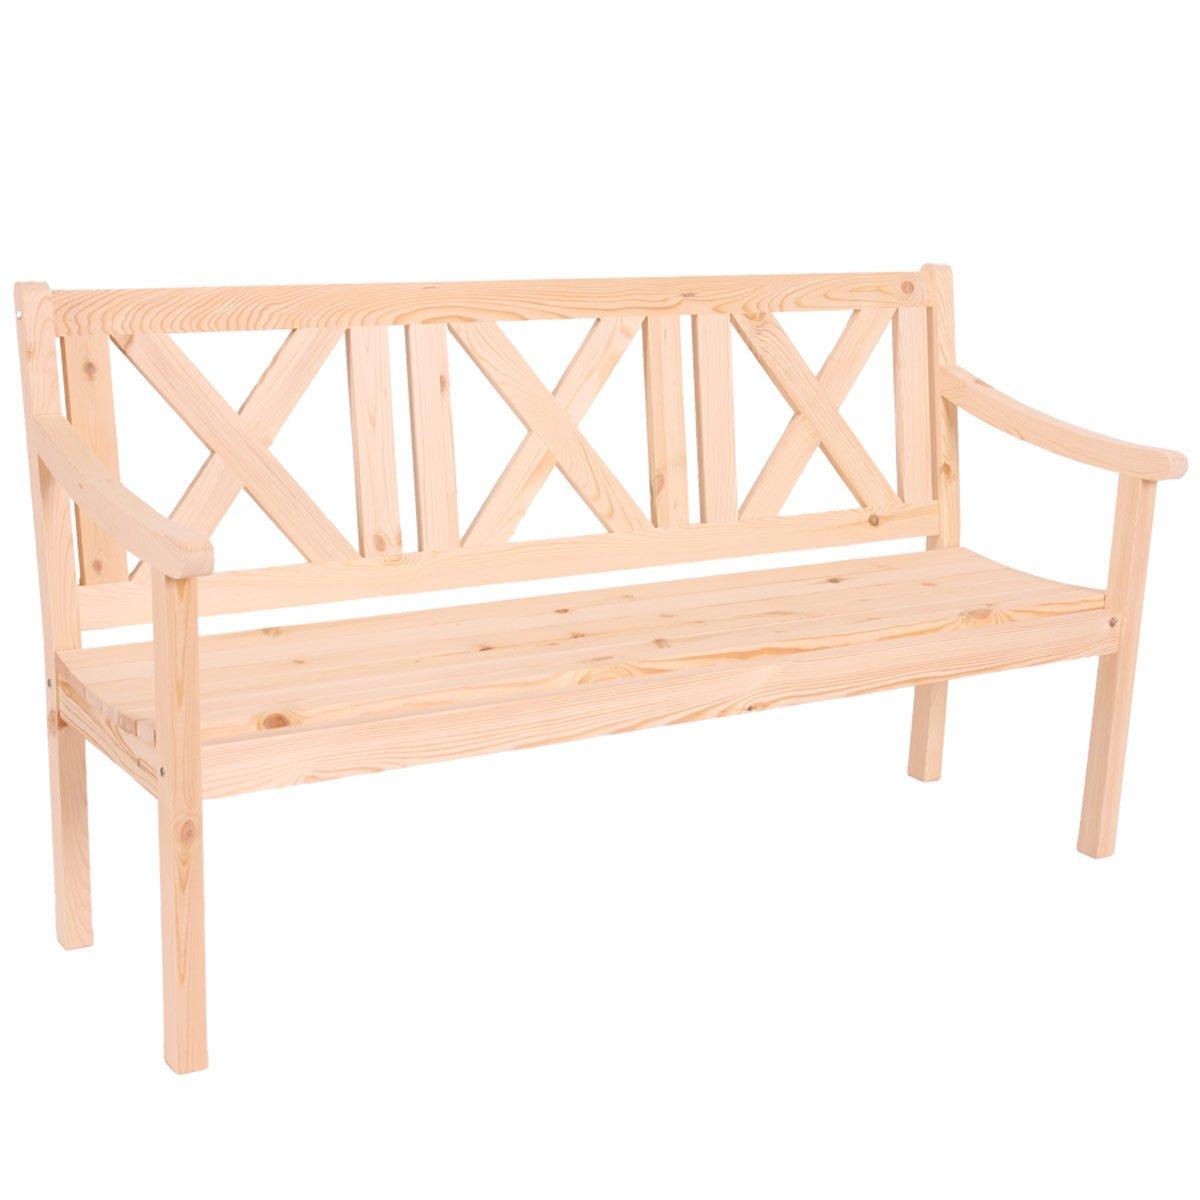 Banco madera 3 plazas para jard n o terraza copenhaguen for Bancos de jardin precios